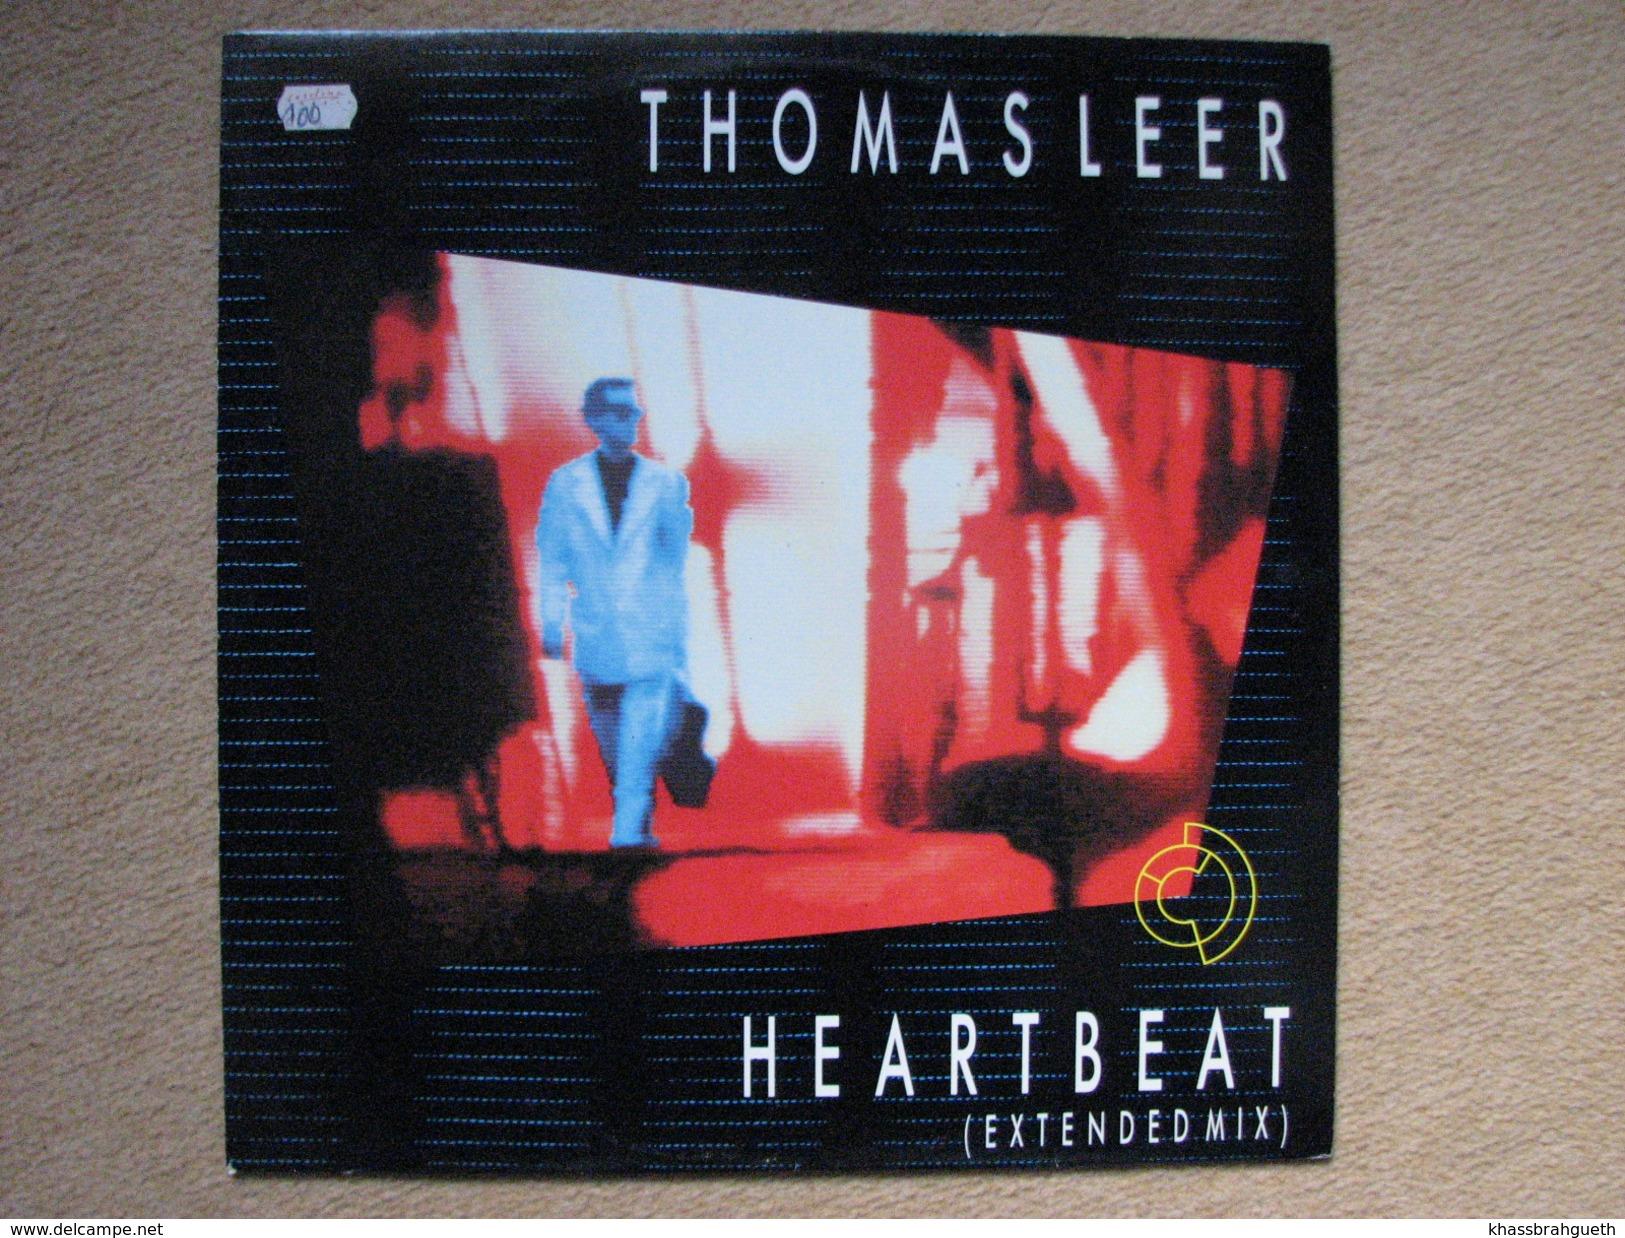 THOMAS LEER - HEARTBEAT - MAXI (ARISTA RECORDS 1985) - 45 T - Maxi-Single